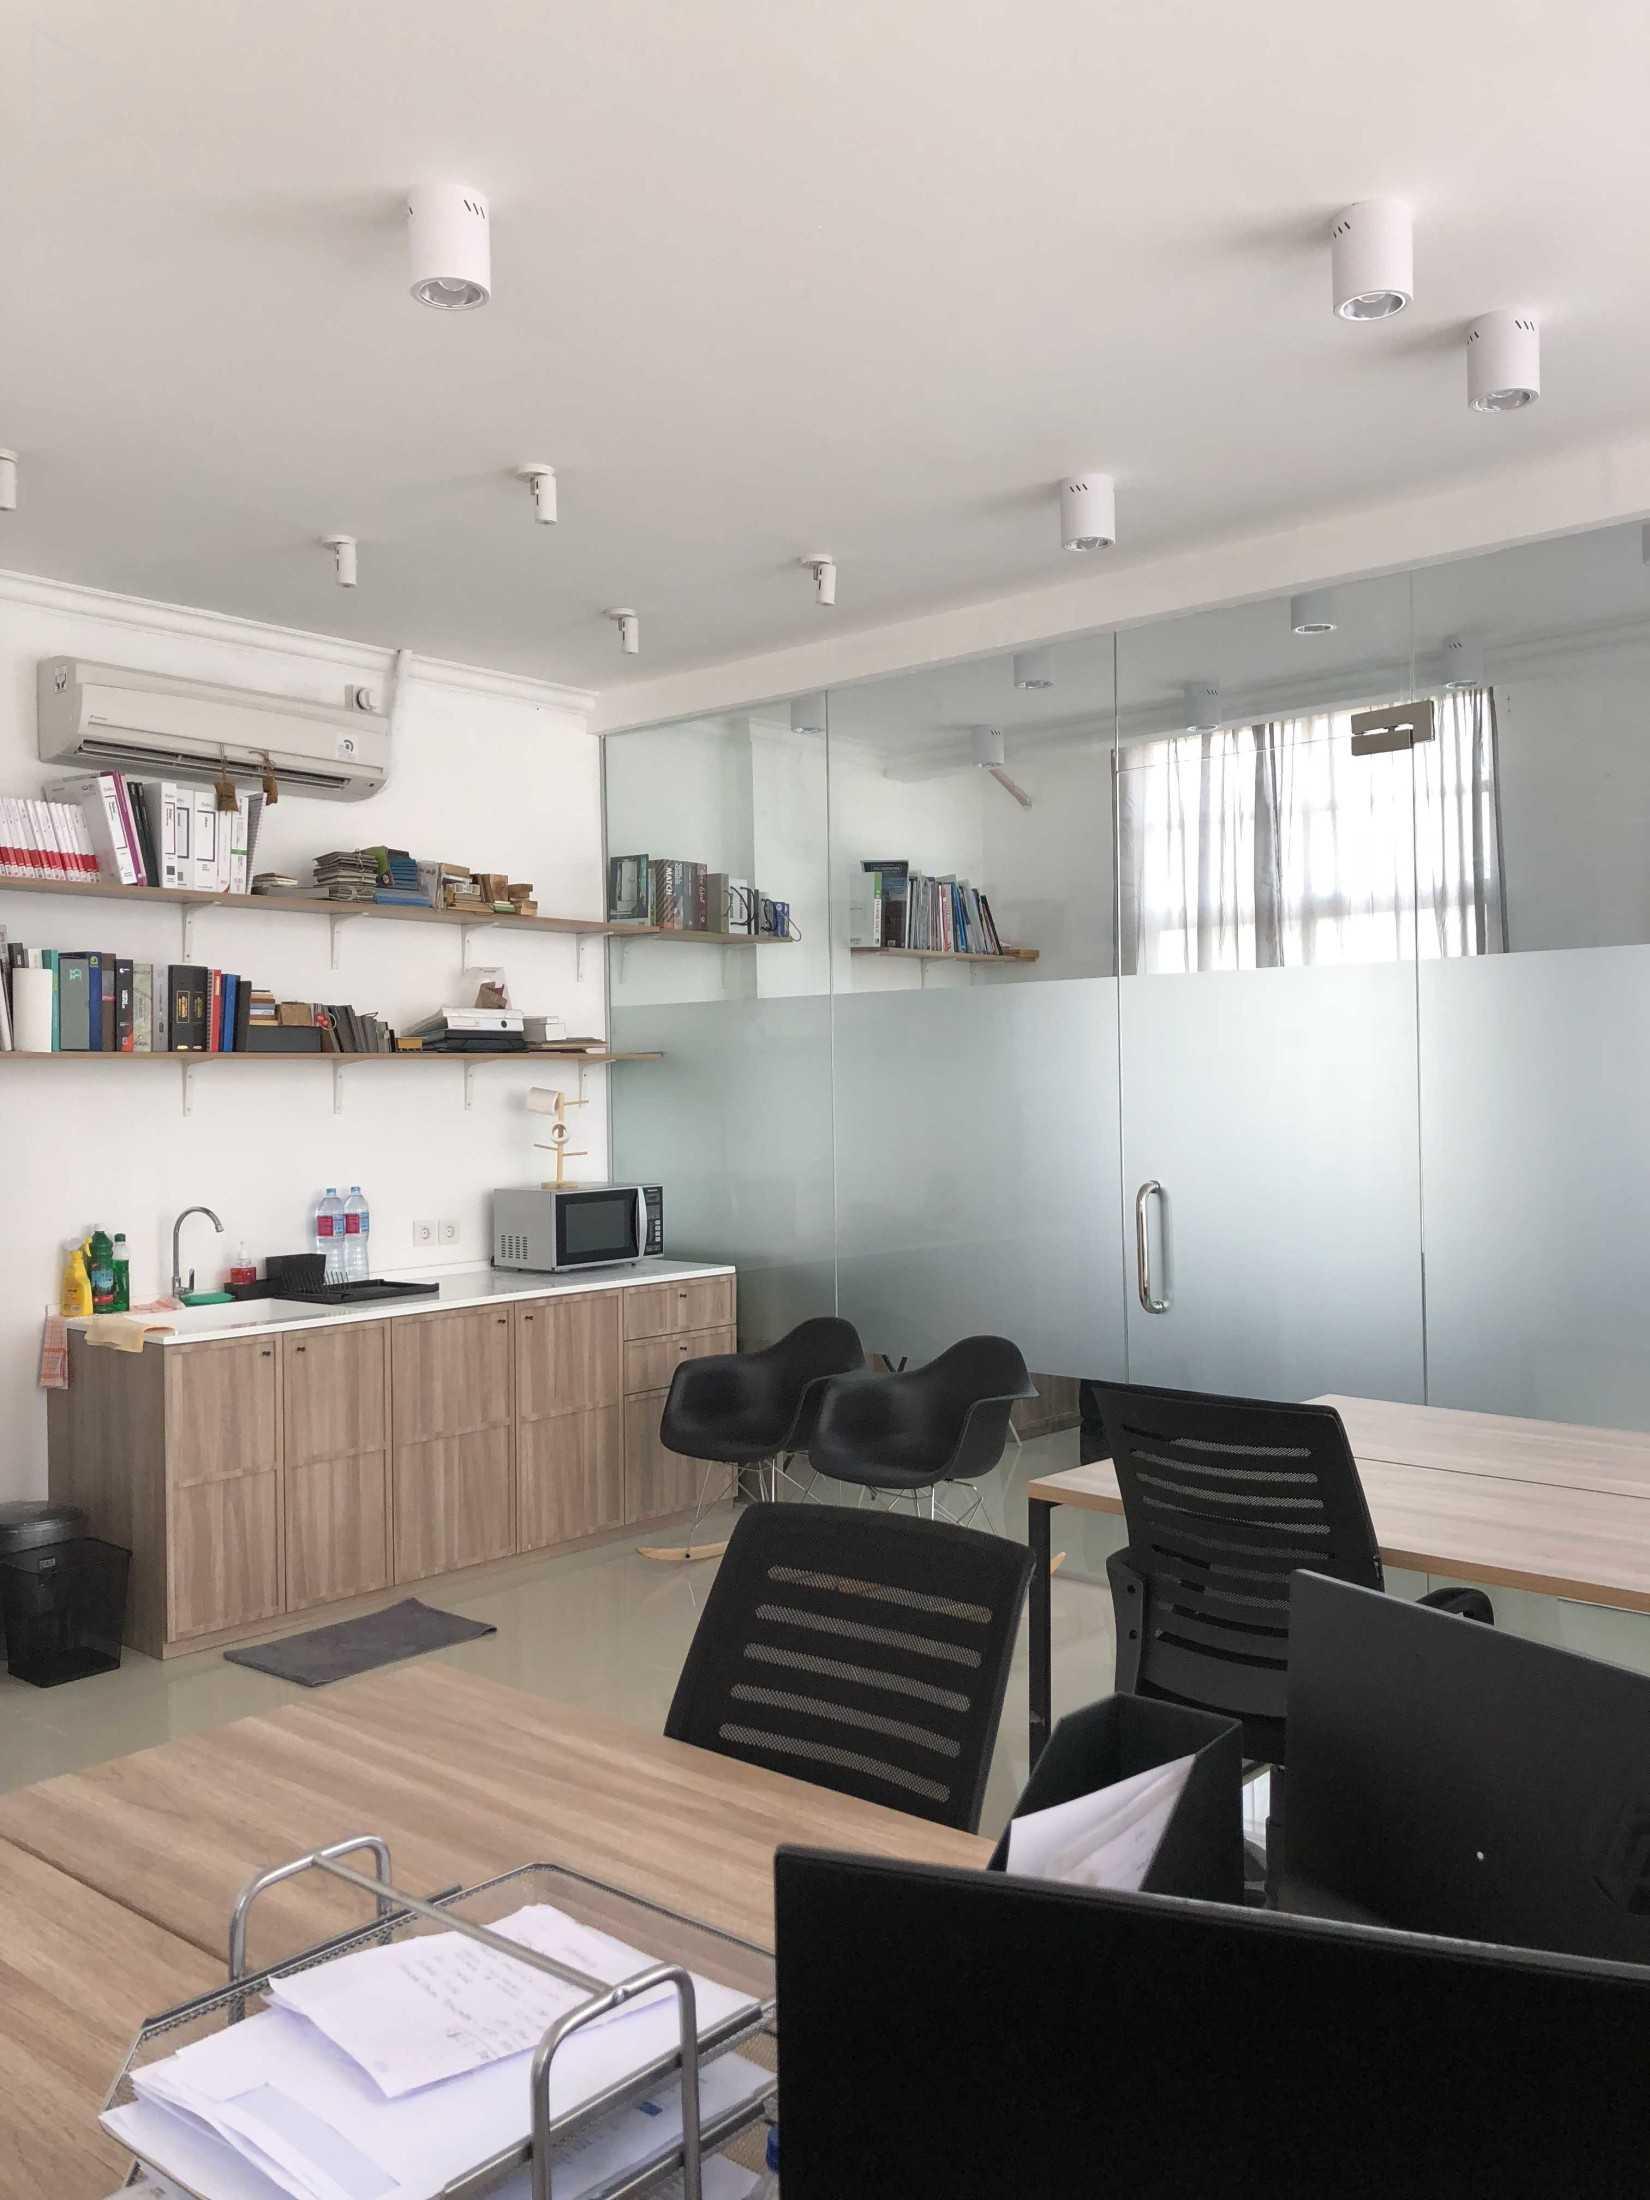 Ties Design & Build Ts Office Jl. Green Lake City Boulevard, Petir, Cipondoh, Kota Tangerang, Banten, Indonesia Jl. Green Lake City Boulevard, Petir, Cipondoh, Kota Tangerang, Banten, Indonesia Pantry  68666